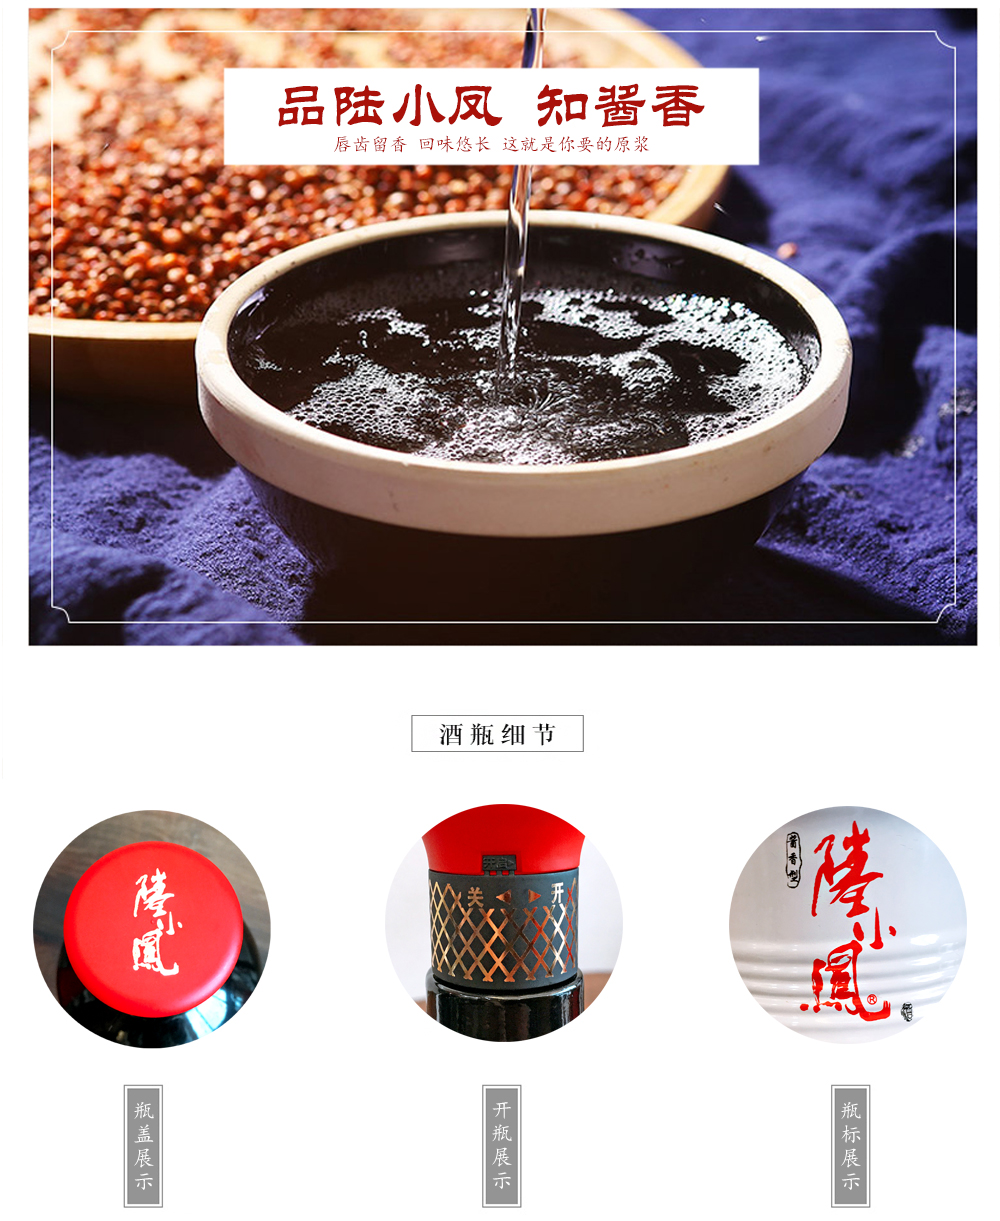 raybet竞赛酒详情_07.jpg